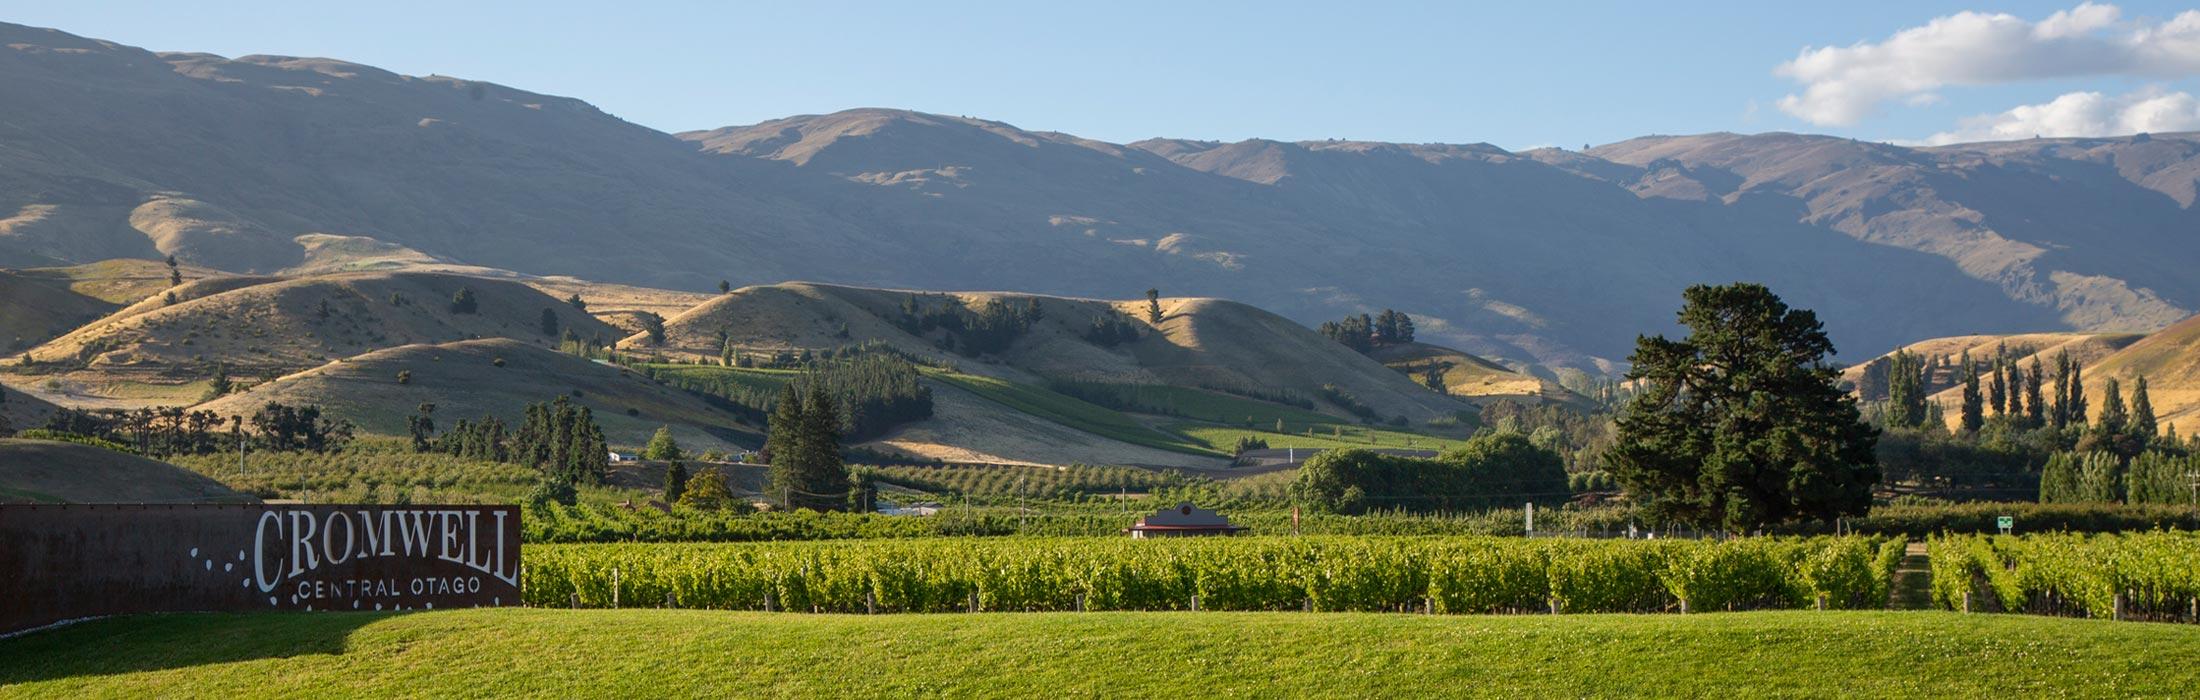 Cromwell Central Otago Landscape